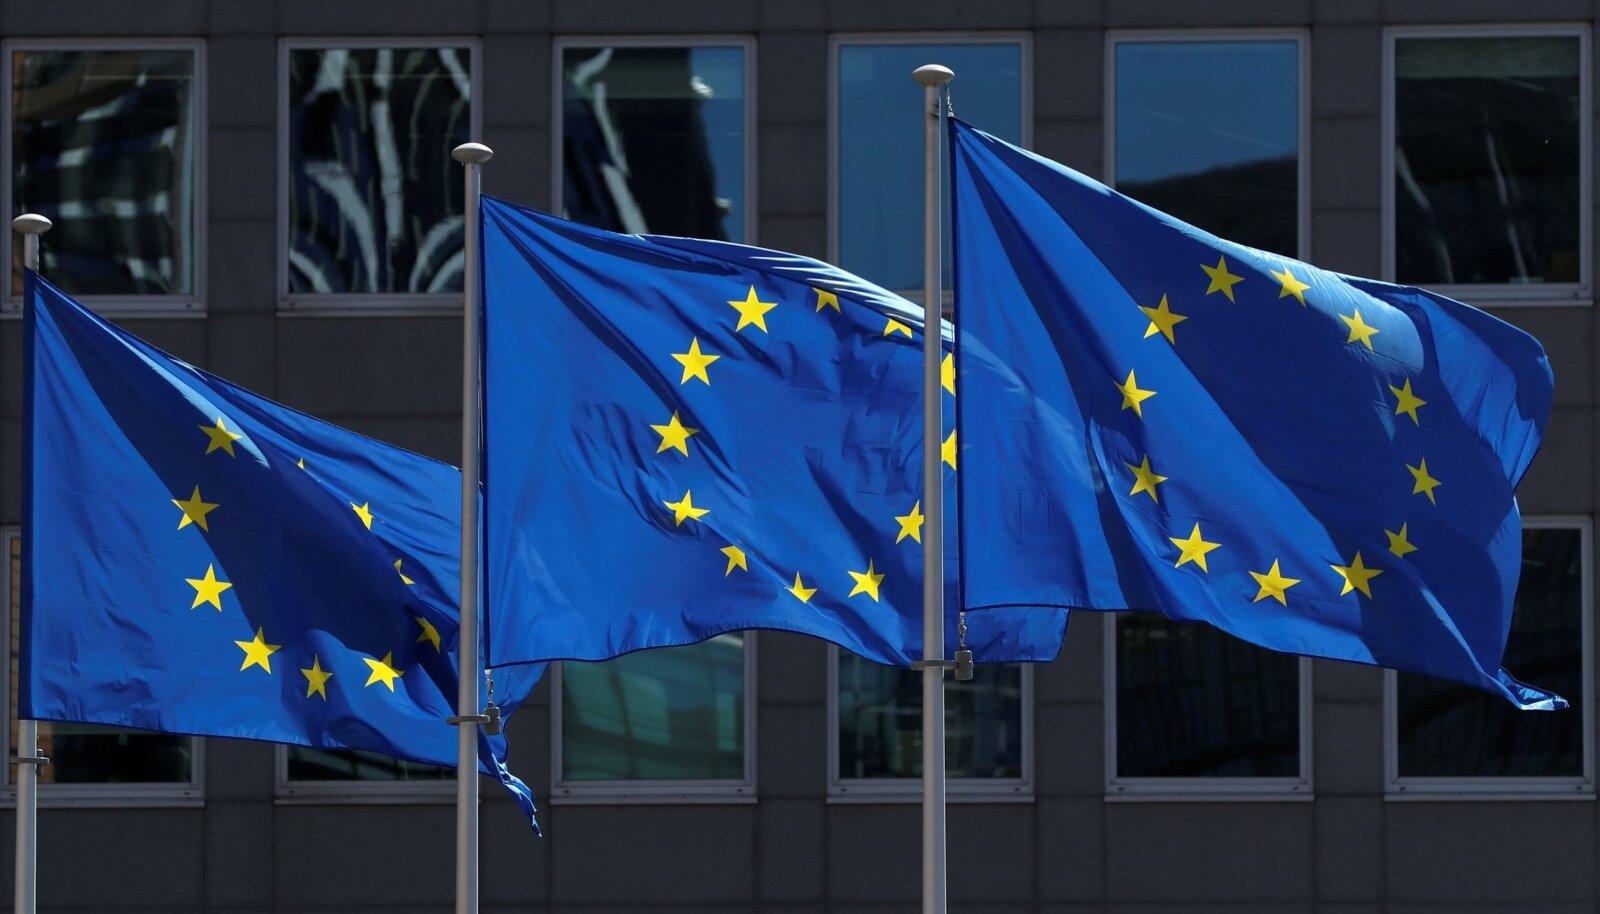 Euroopa Liidu lipud.headquarters in Brussels